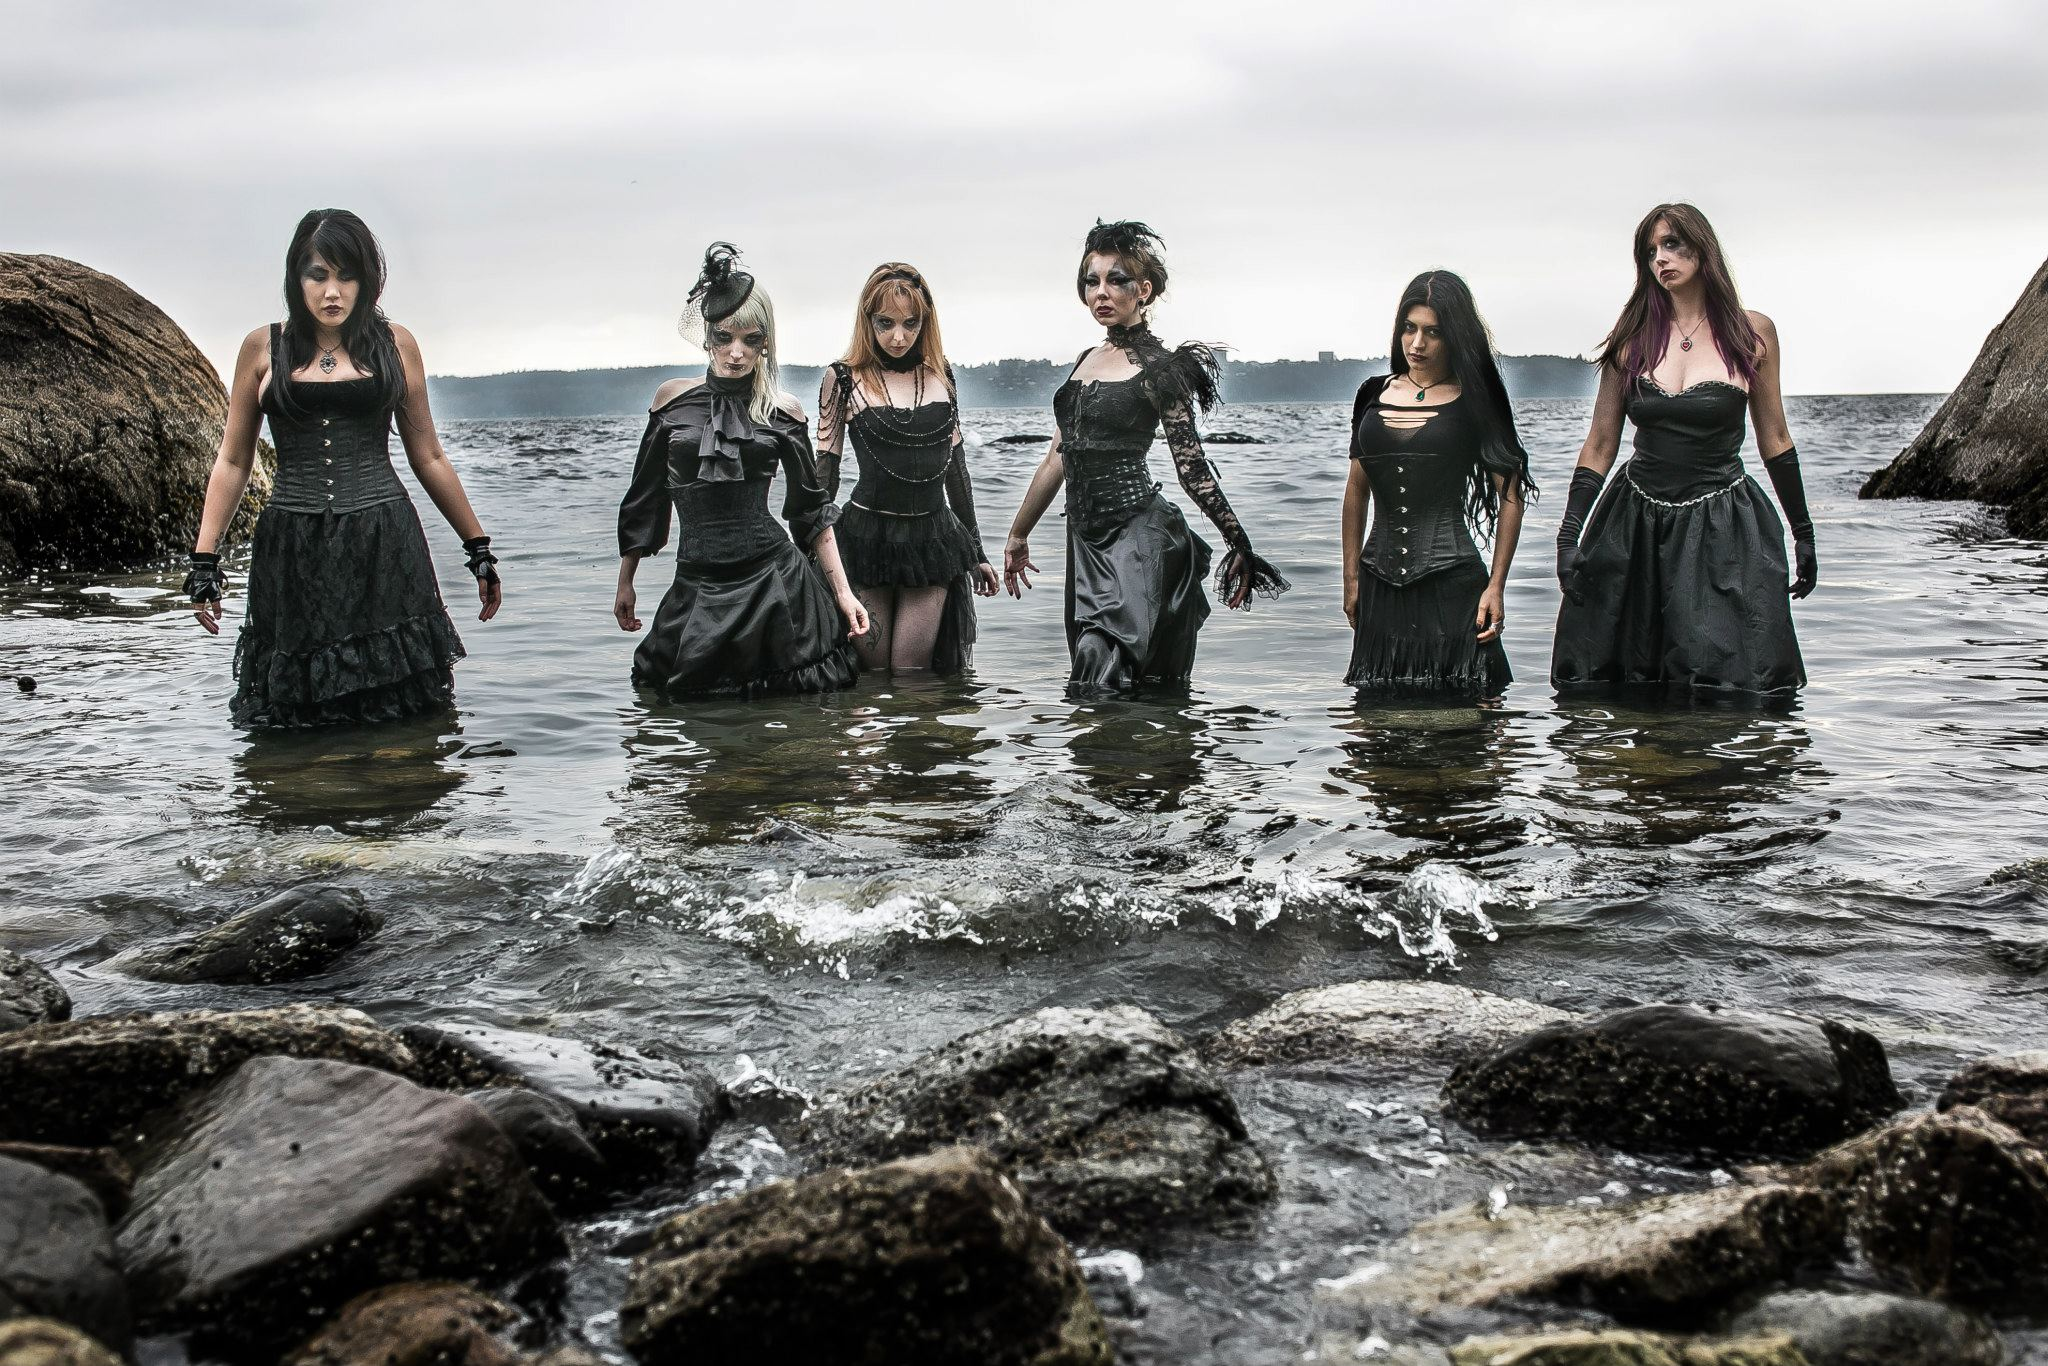 The Black Tide by Mahafsoun